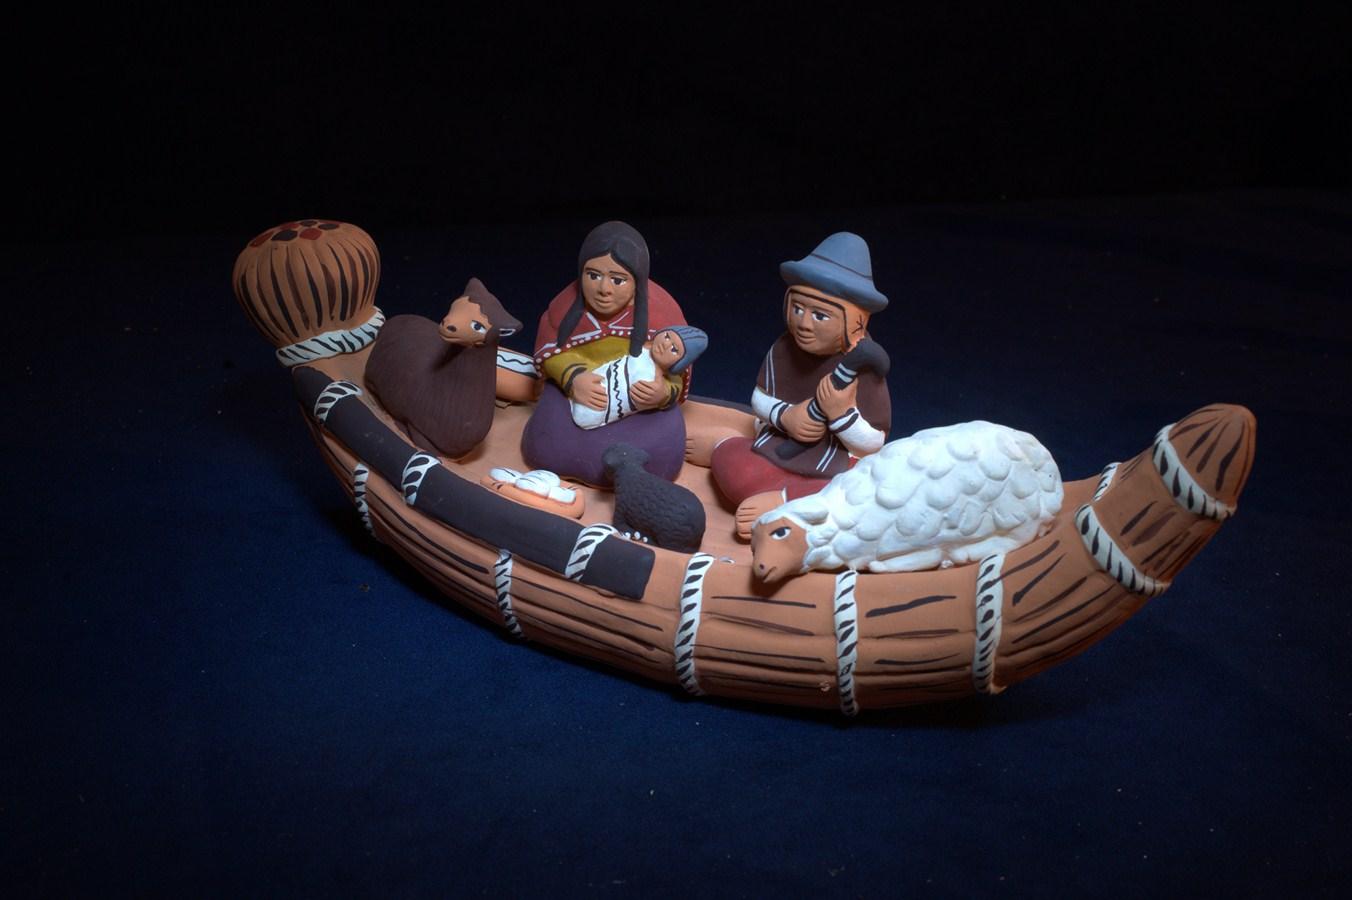 Creche de noel - Brenouille - perou barque